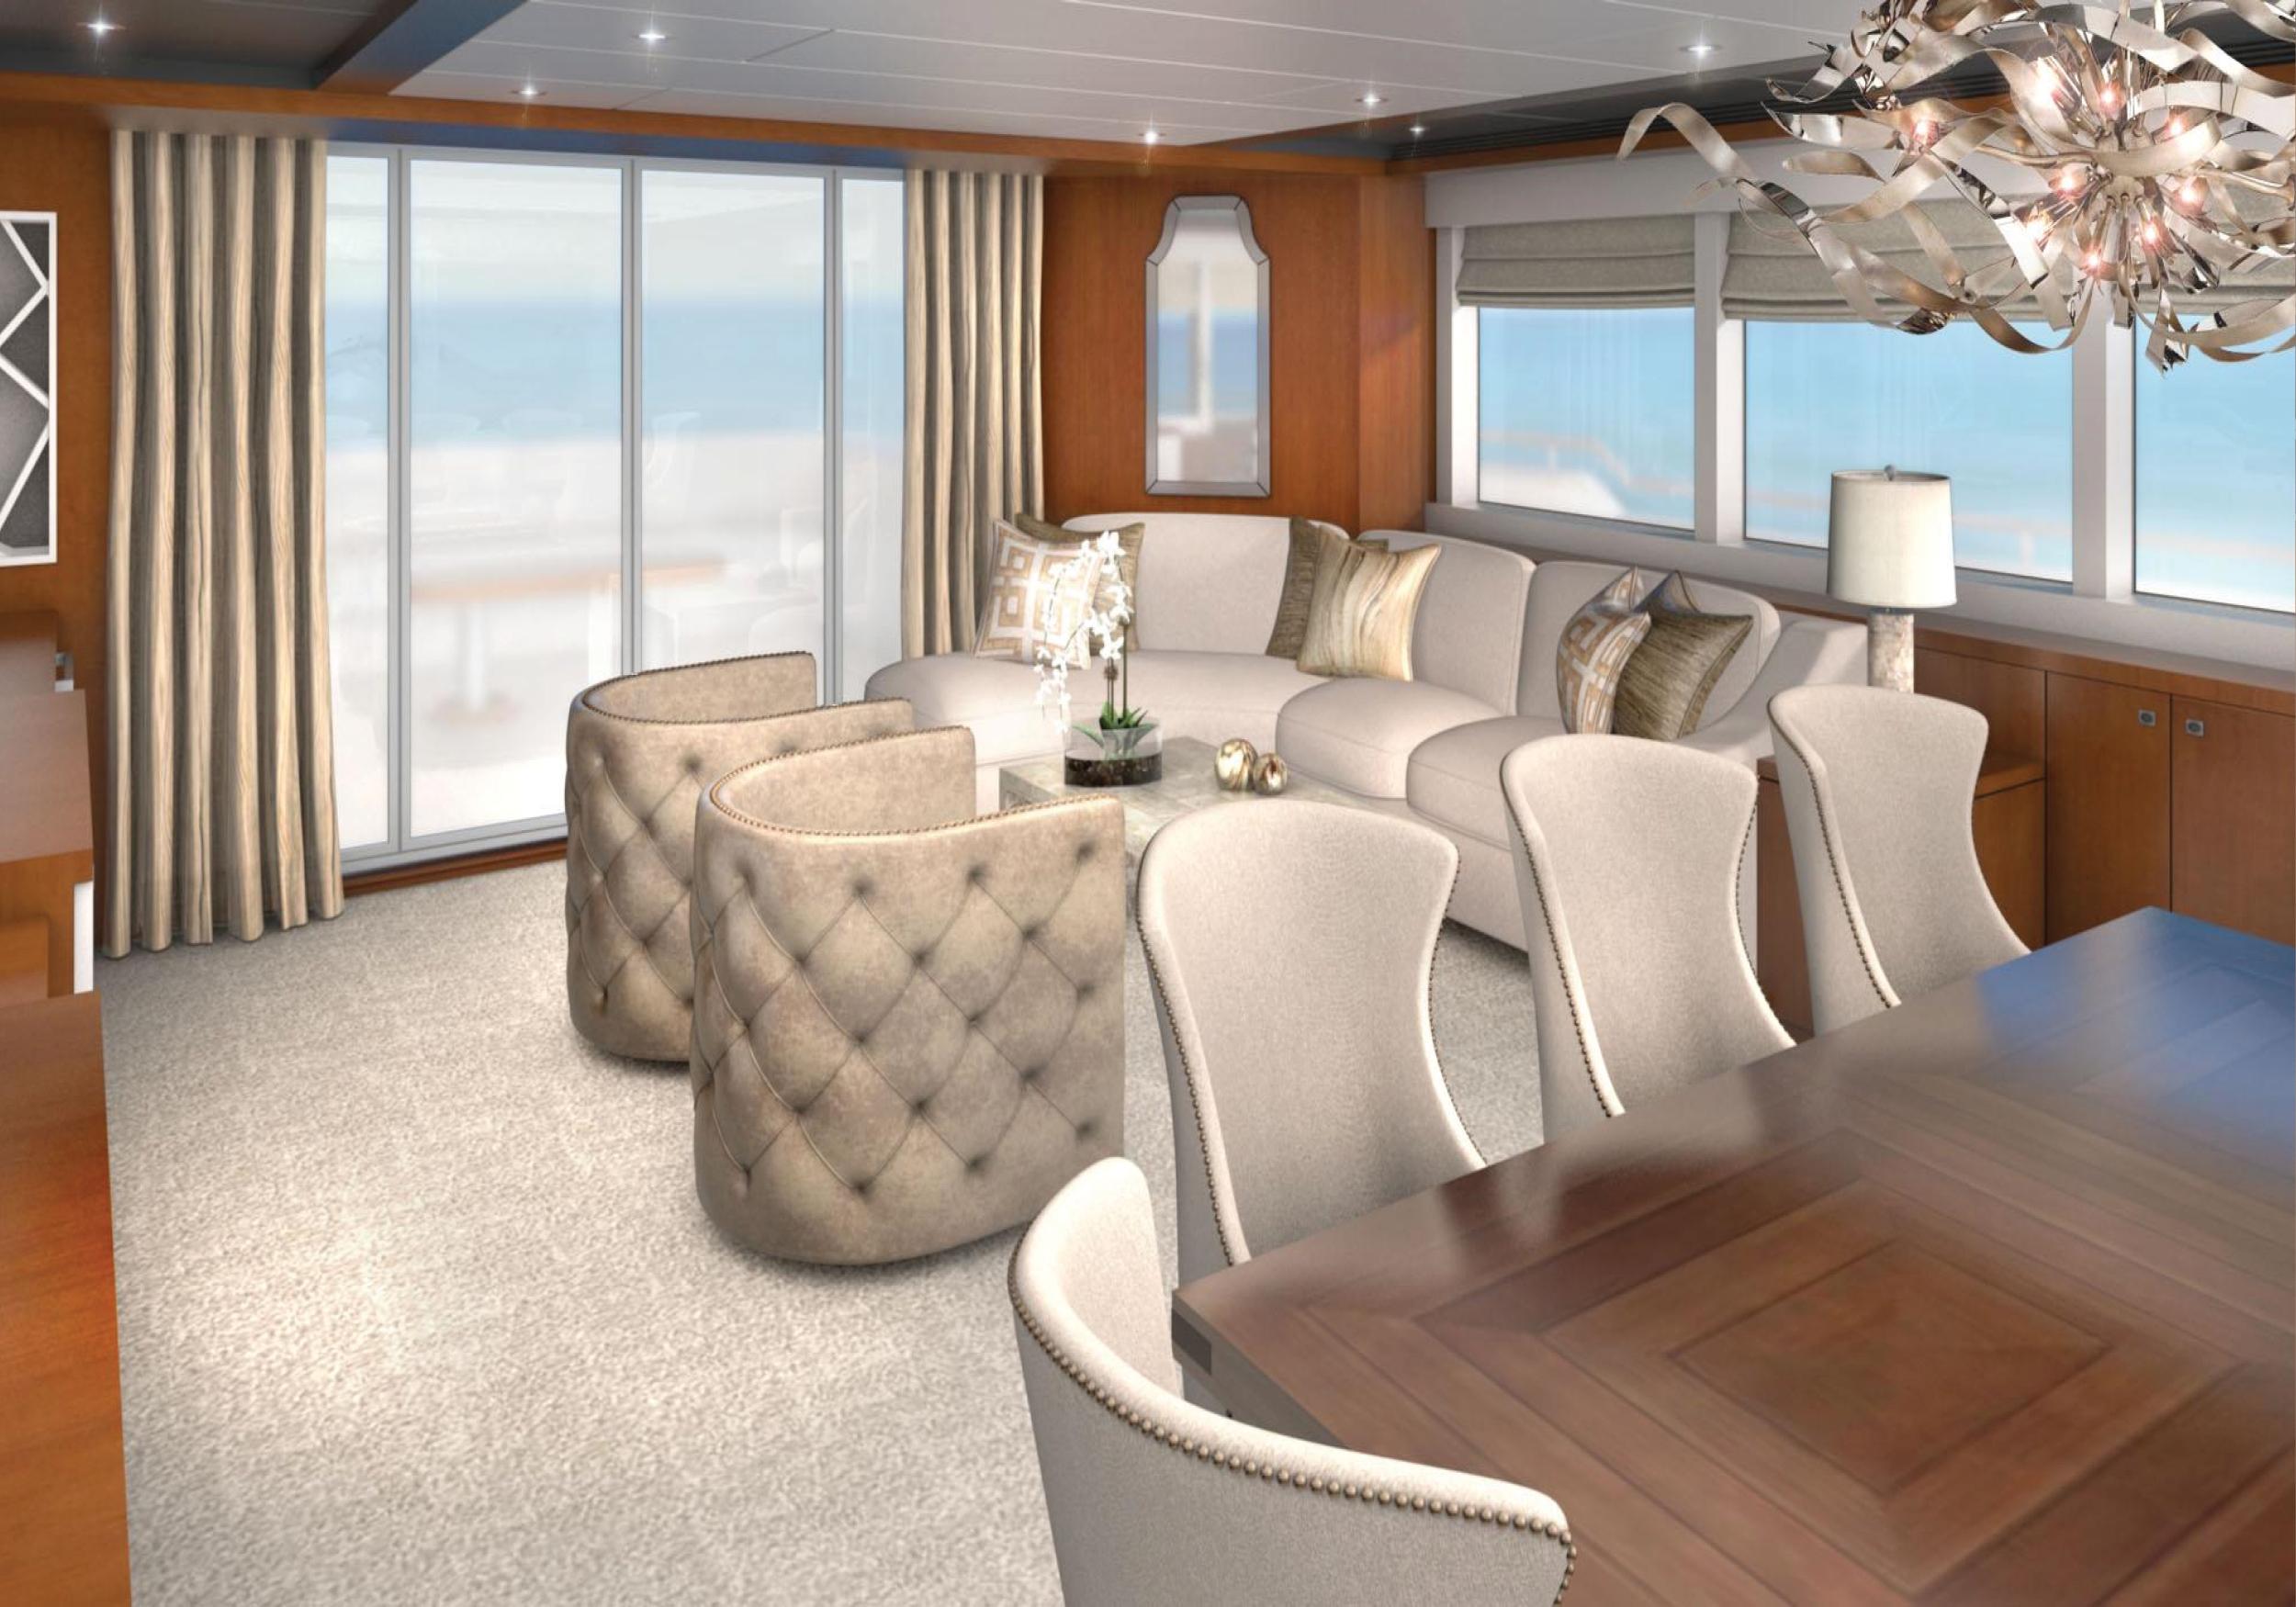 Karen-Lynn-Interior-Design-Yacht-Johnson93-2.jpg